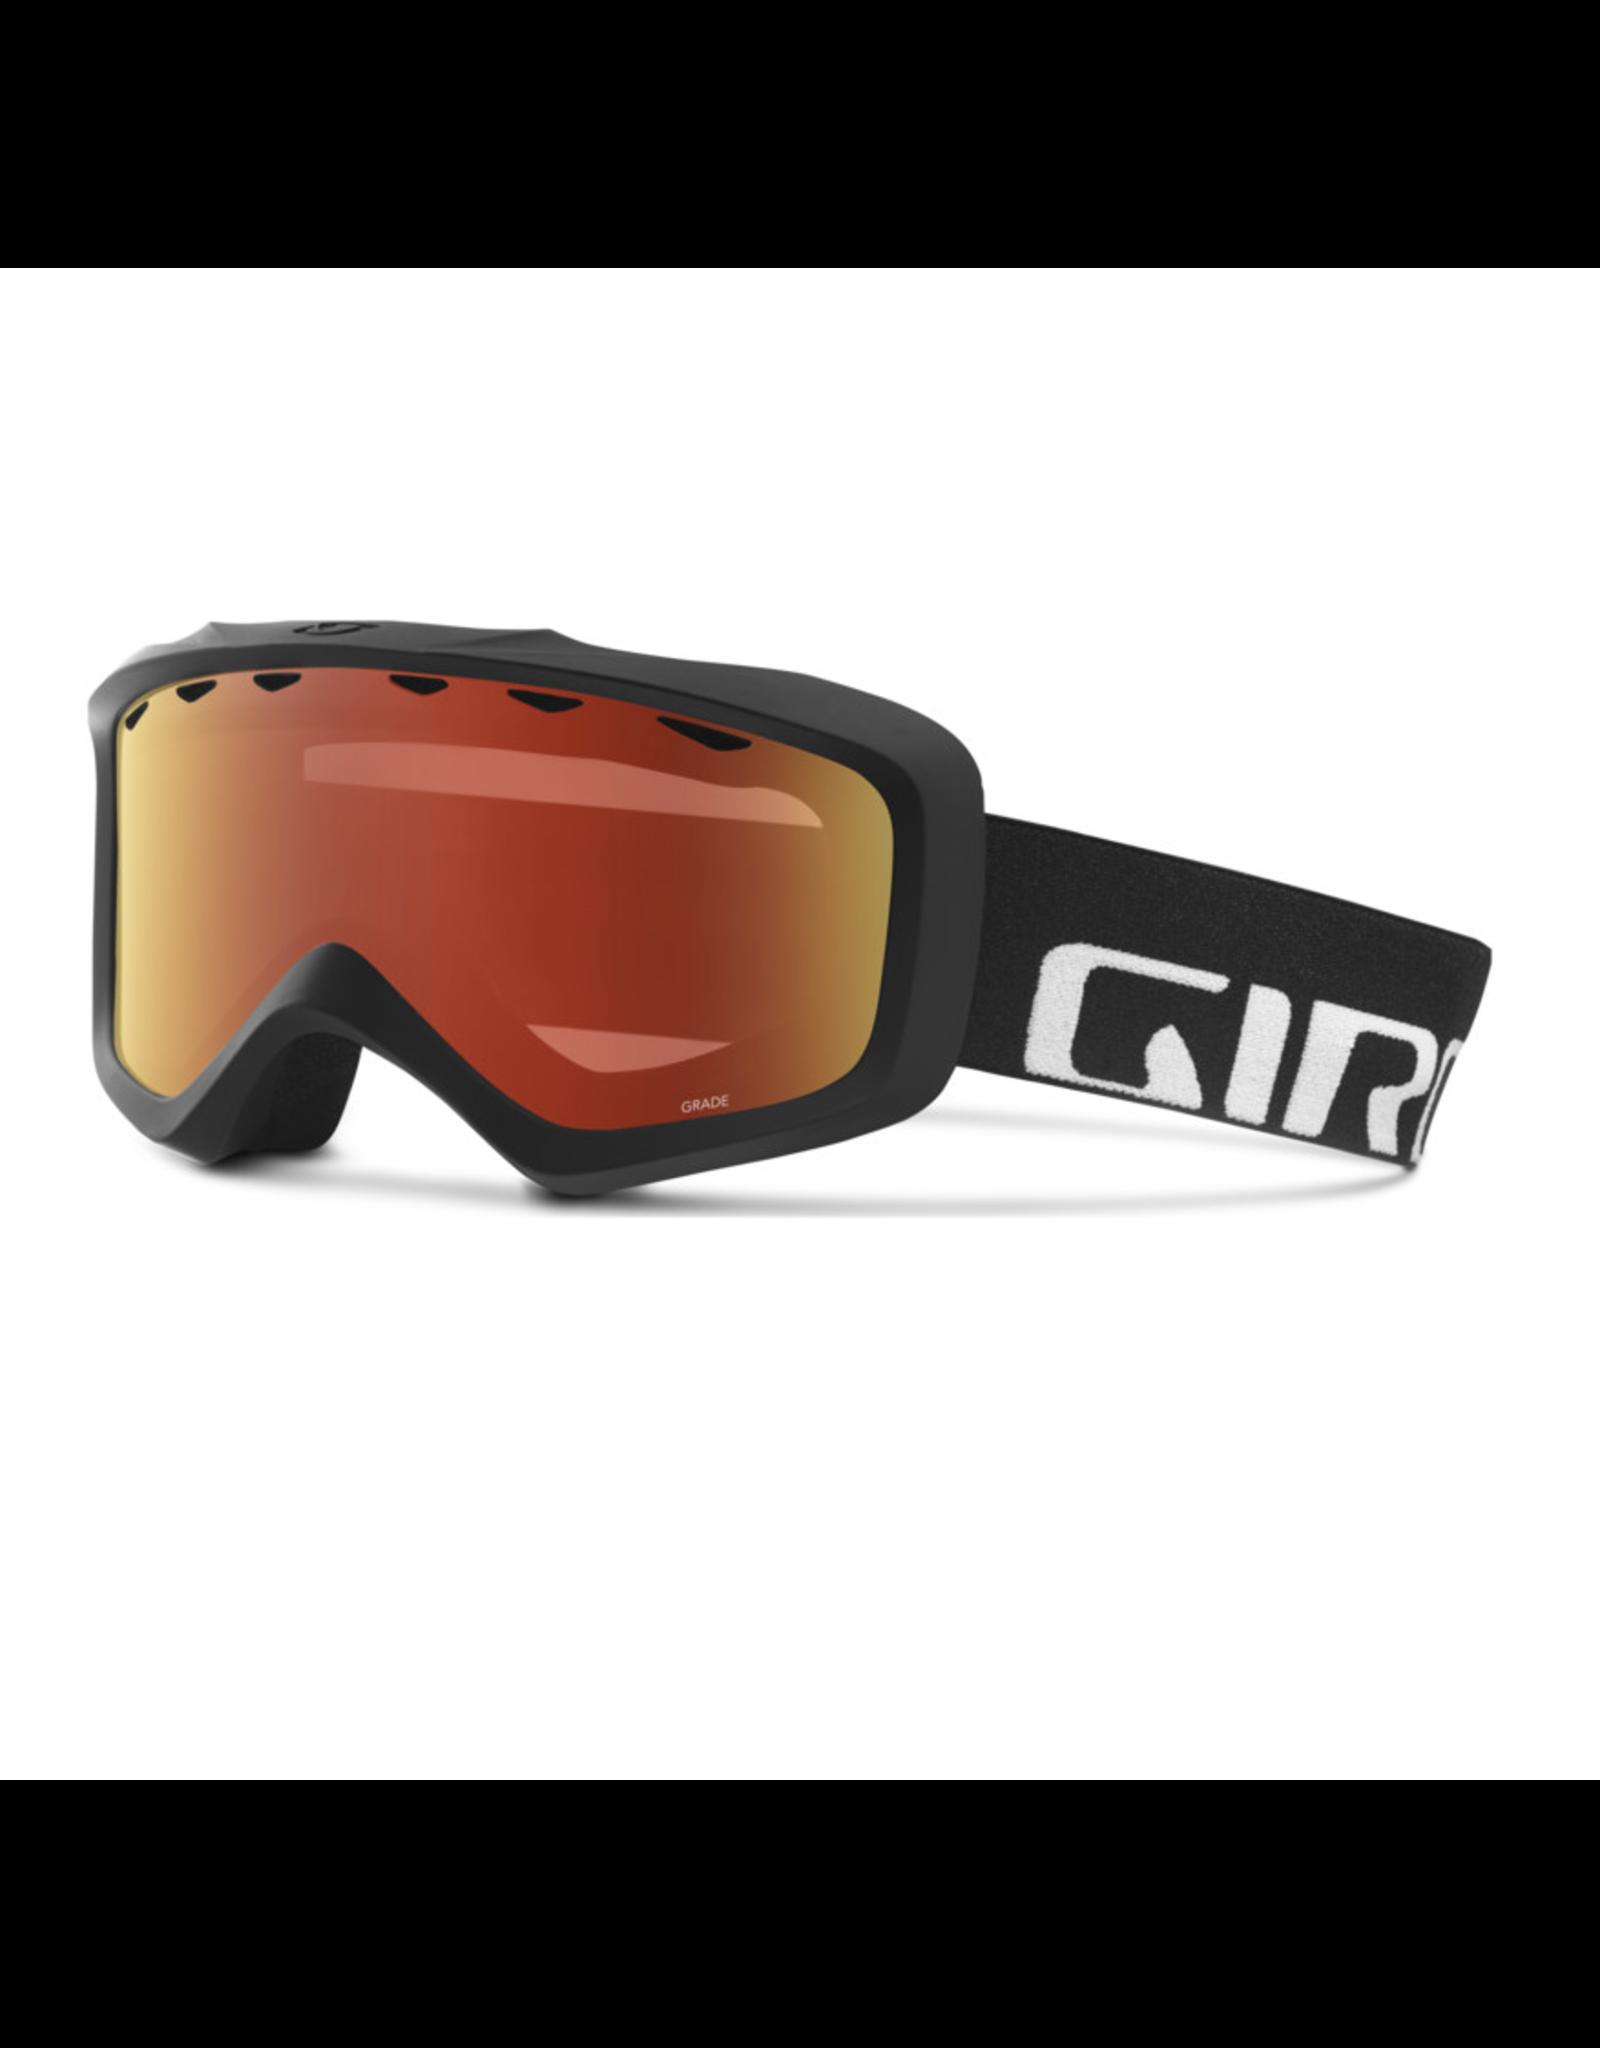 Giro Giro Goggle, Grade